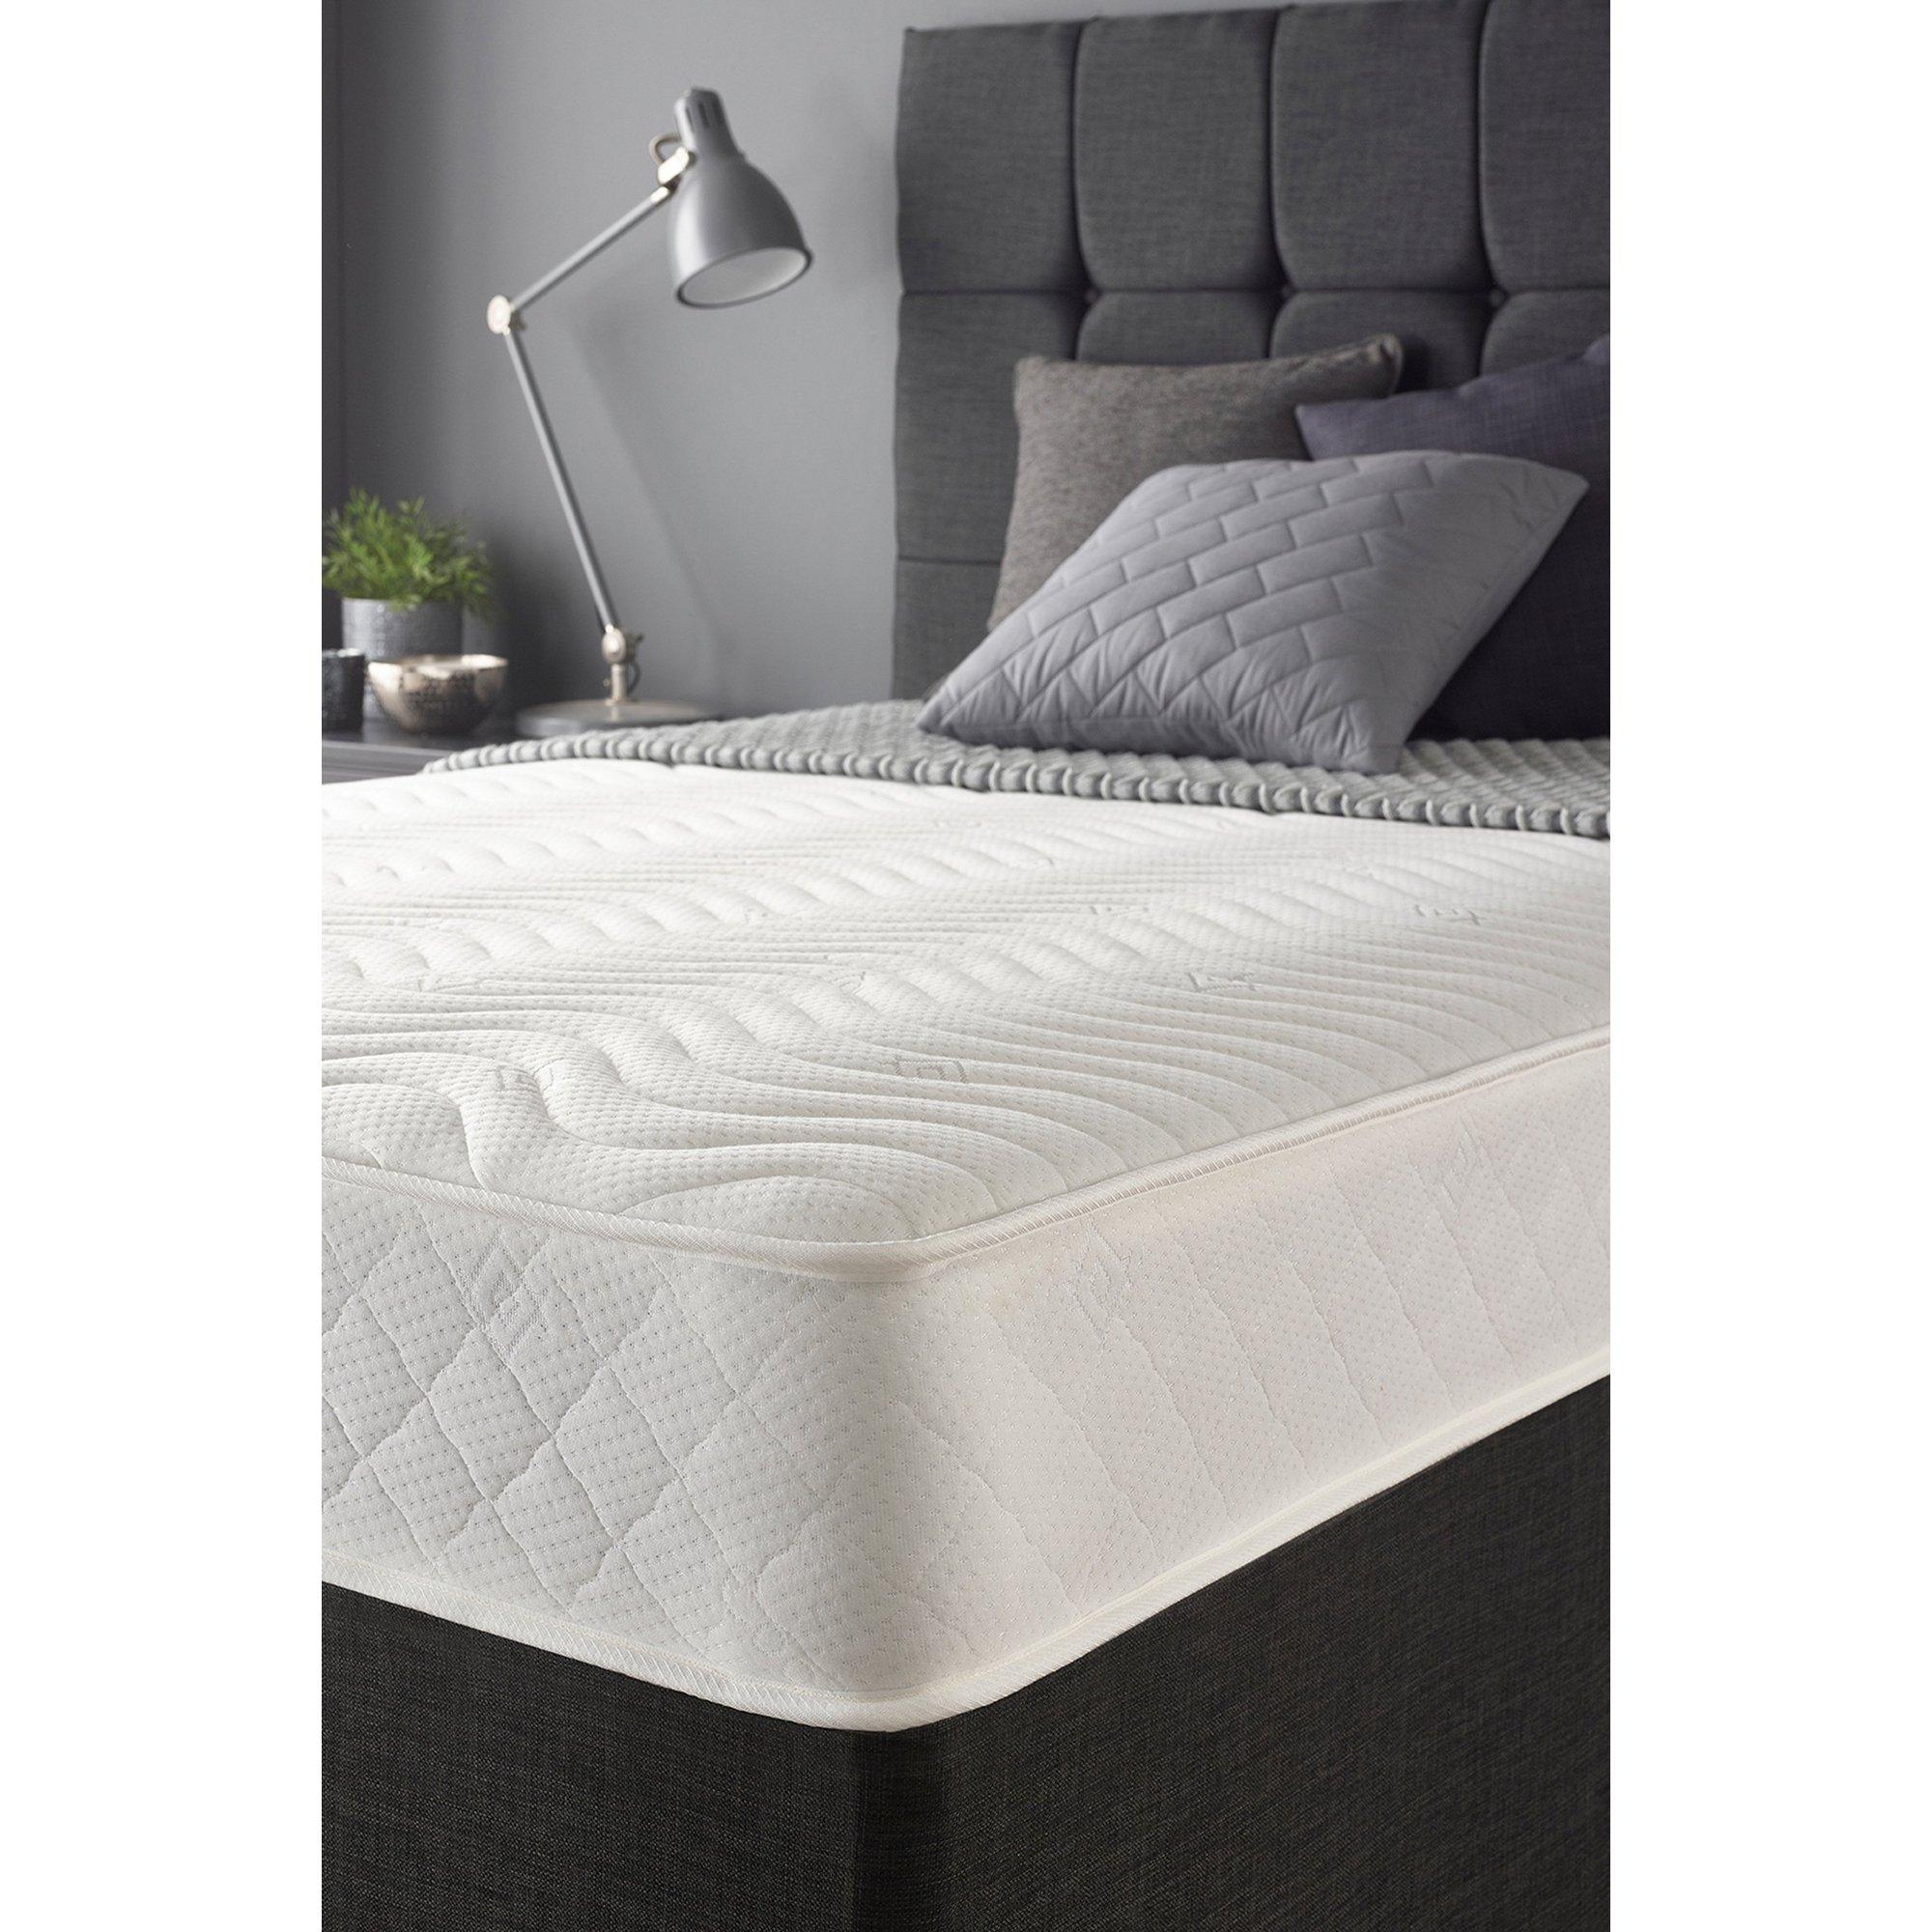 Image of Catherine Lansfield Hybrid Comfort Mattress